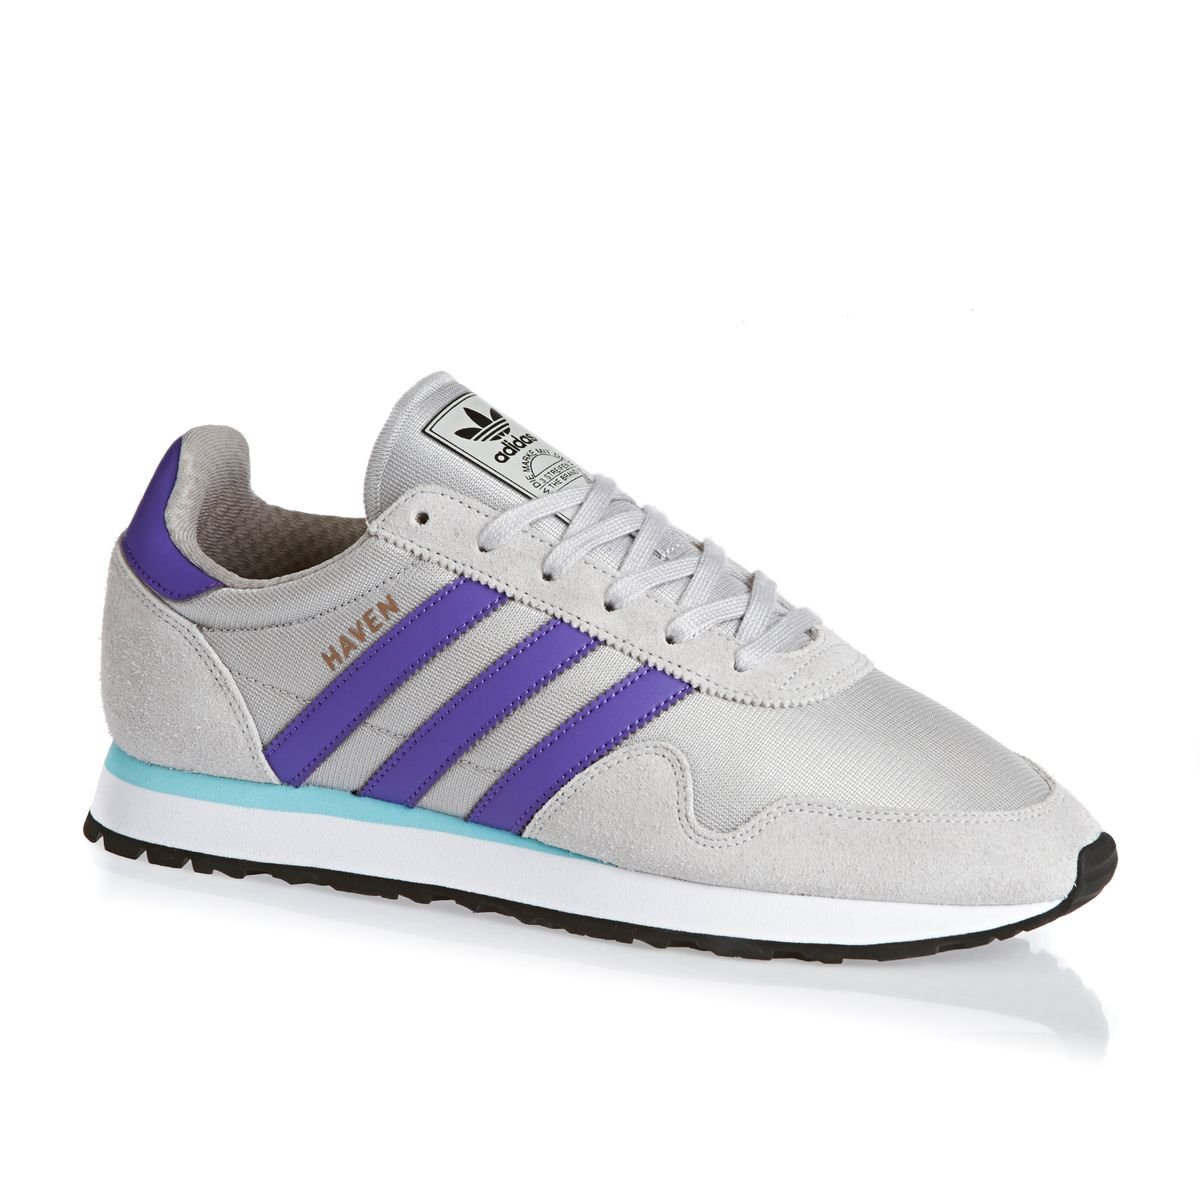 adidas Haven Schuhe schwarz gute Sal EUR41 Damen Sneaker